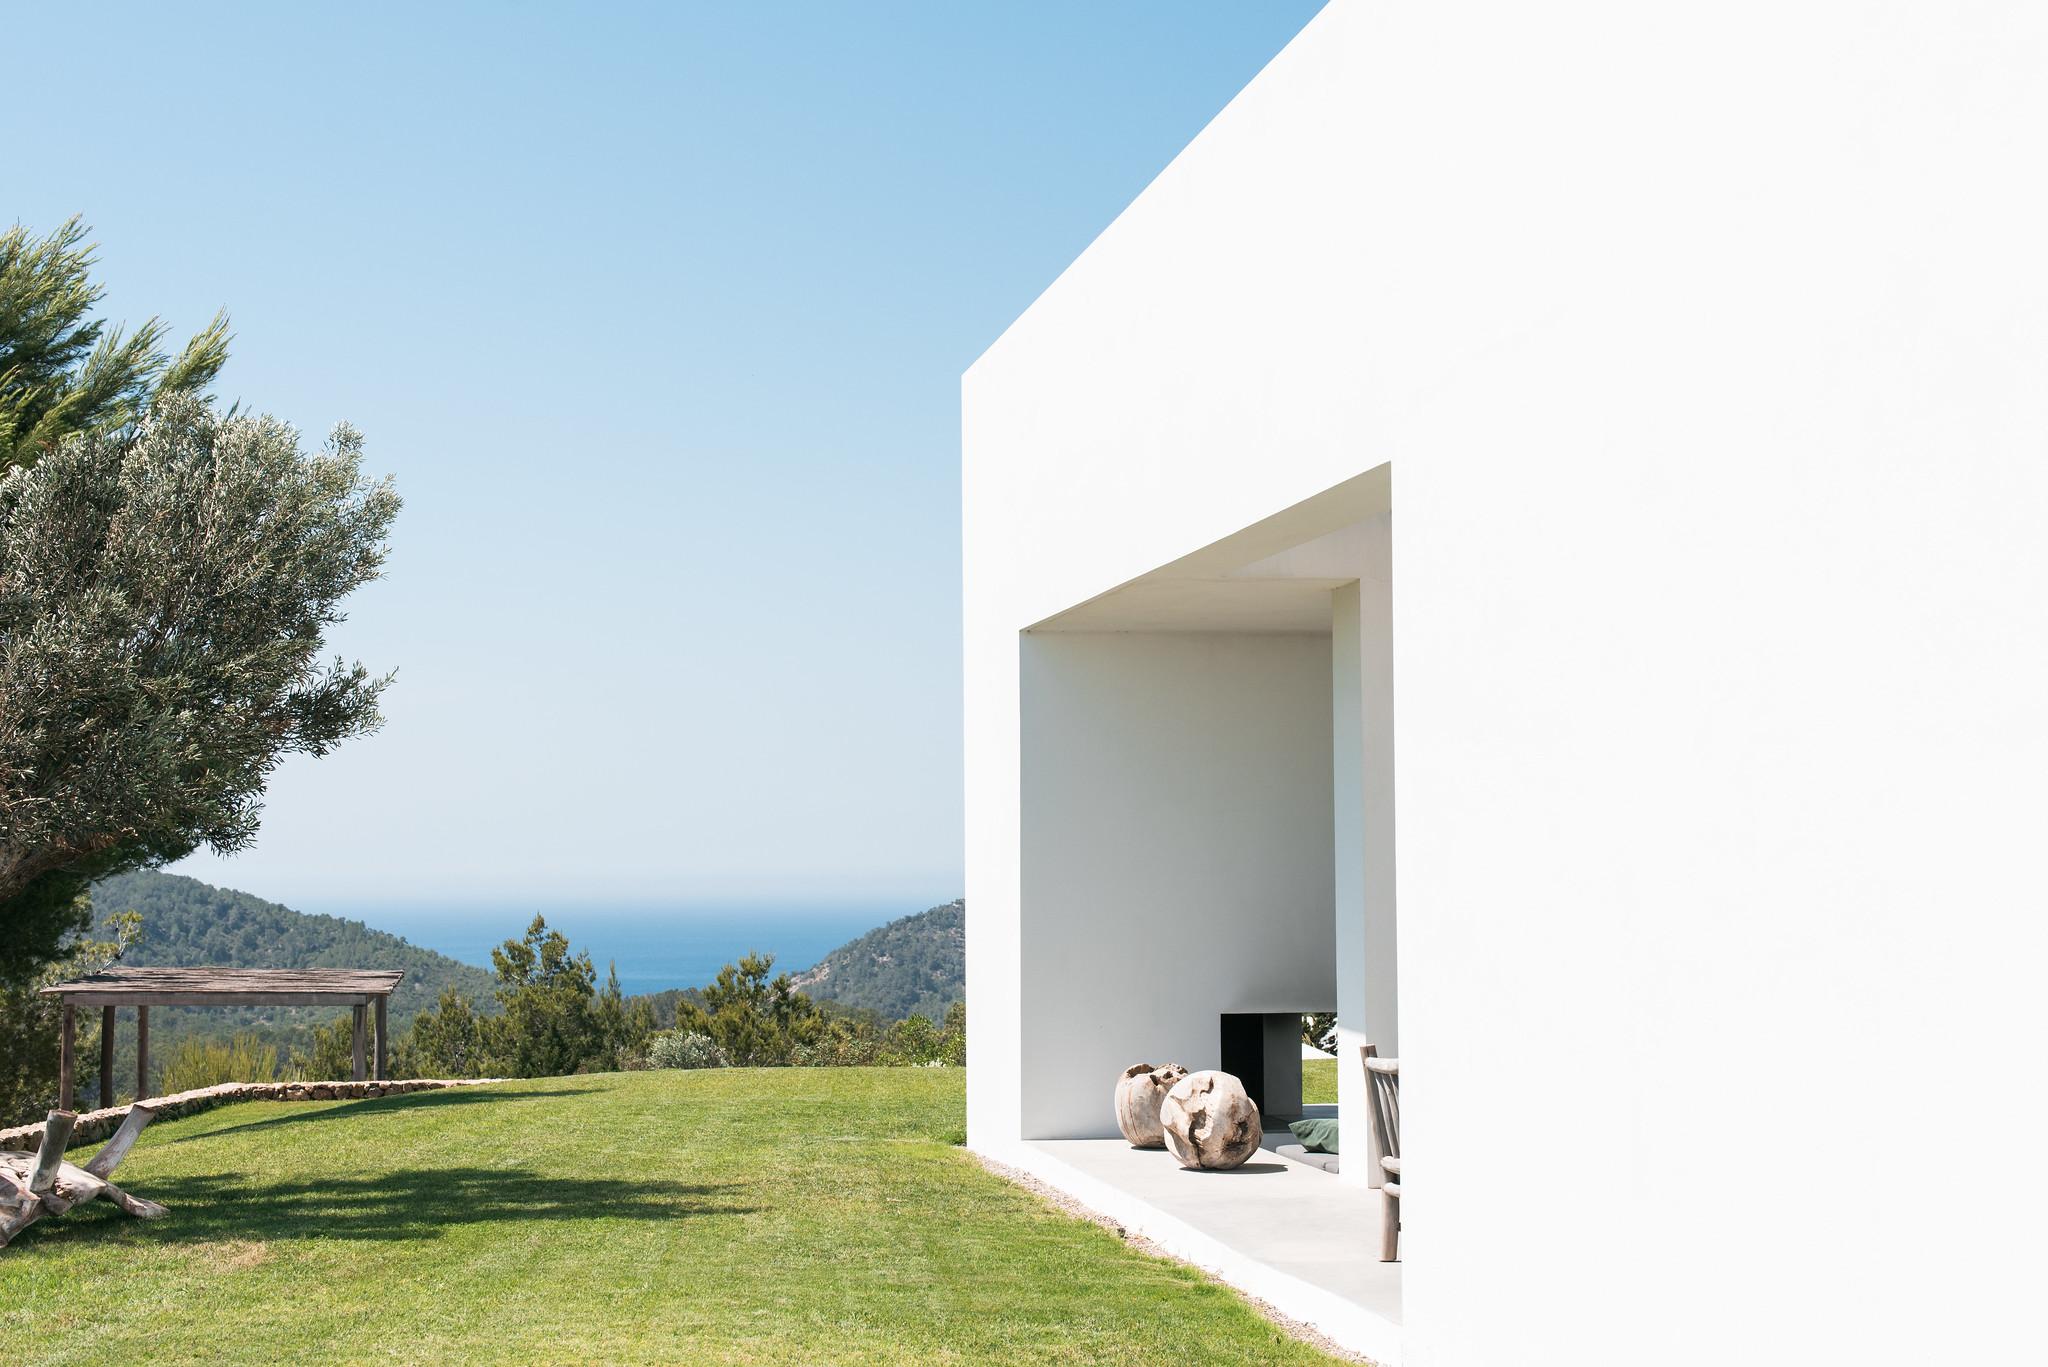 https://www.white-ibiza.com/wp-content/uploads/2020/05/white-ibiza-villas-can-zama-side-of-house.jpg